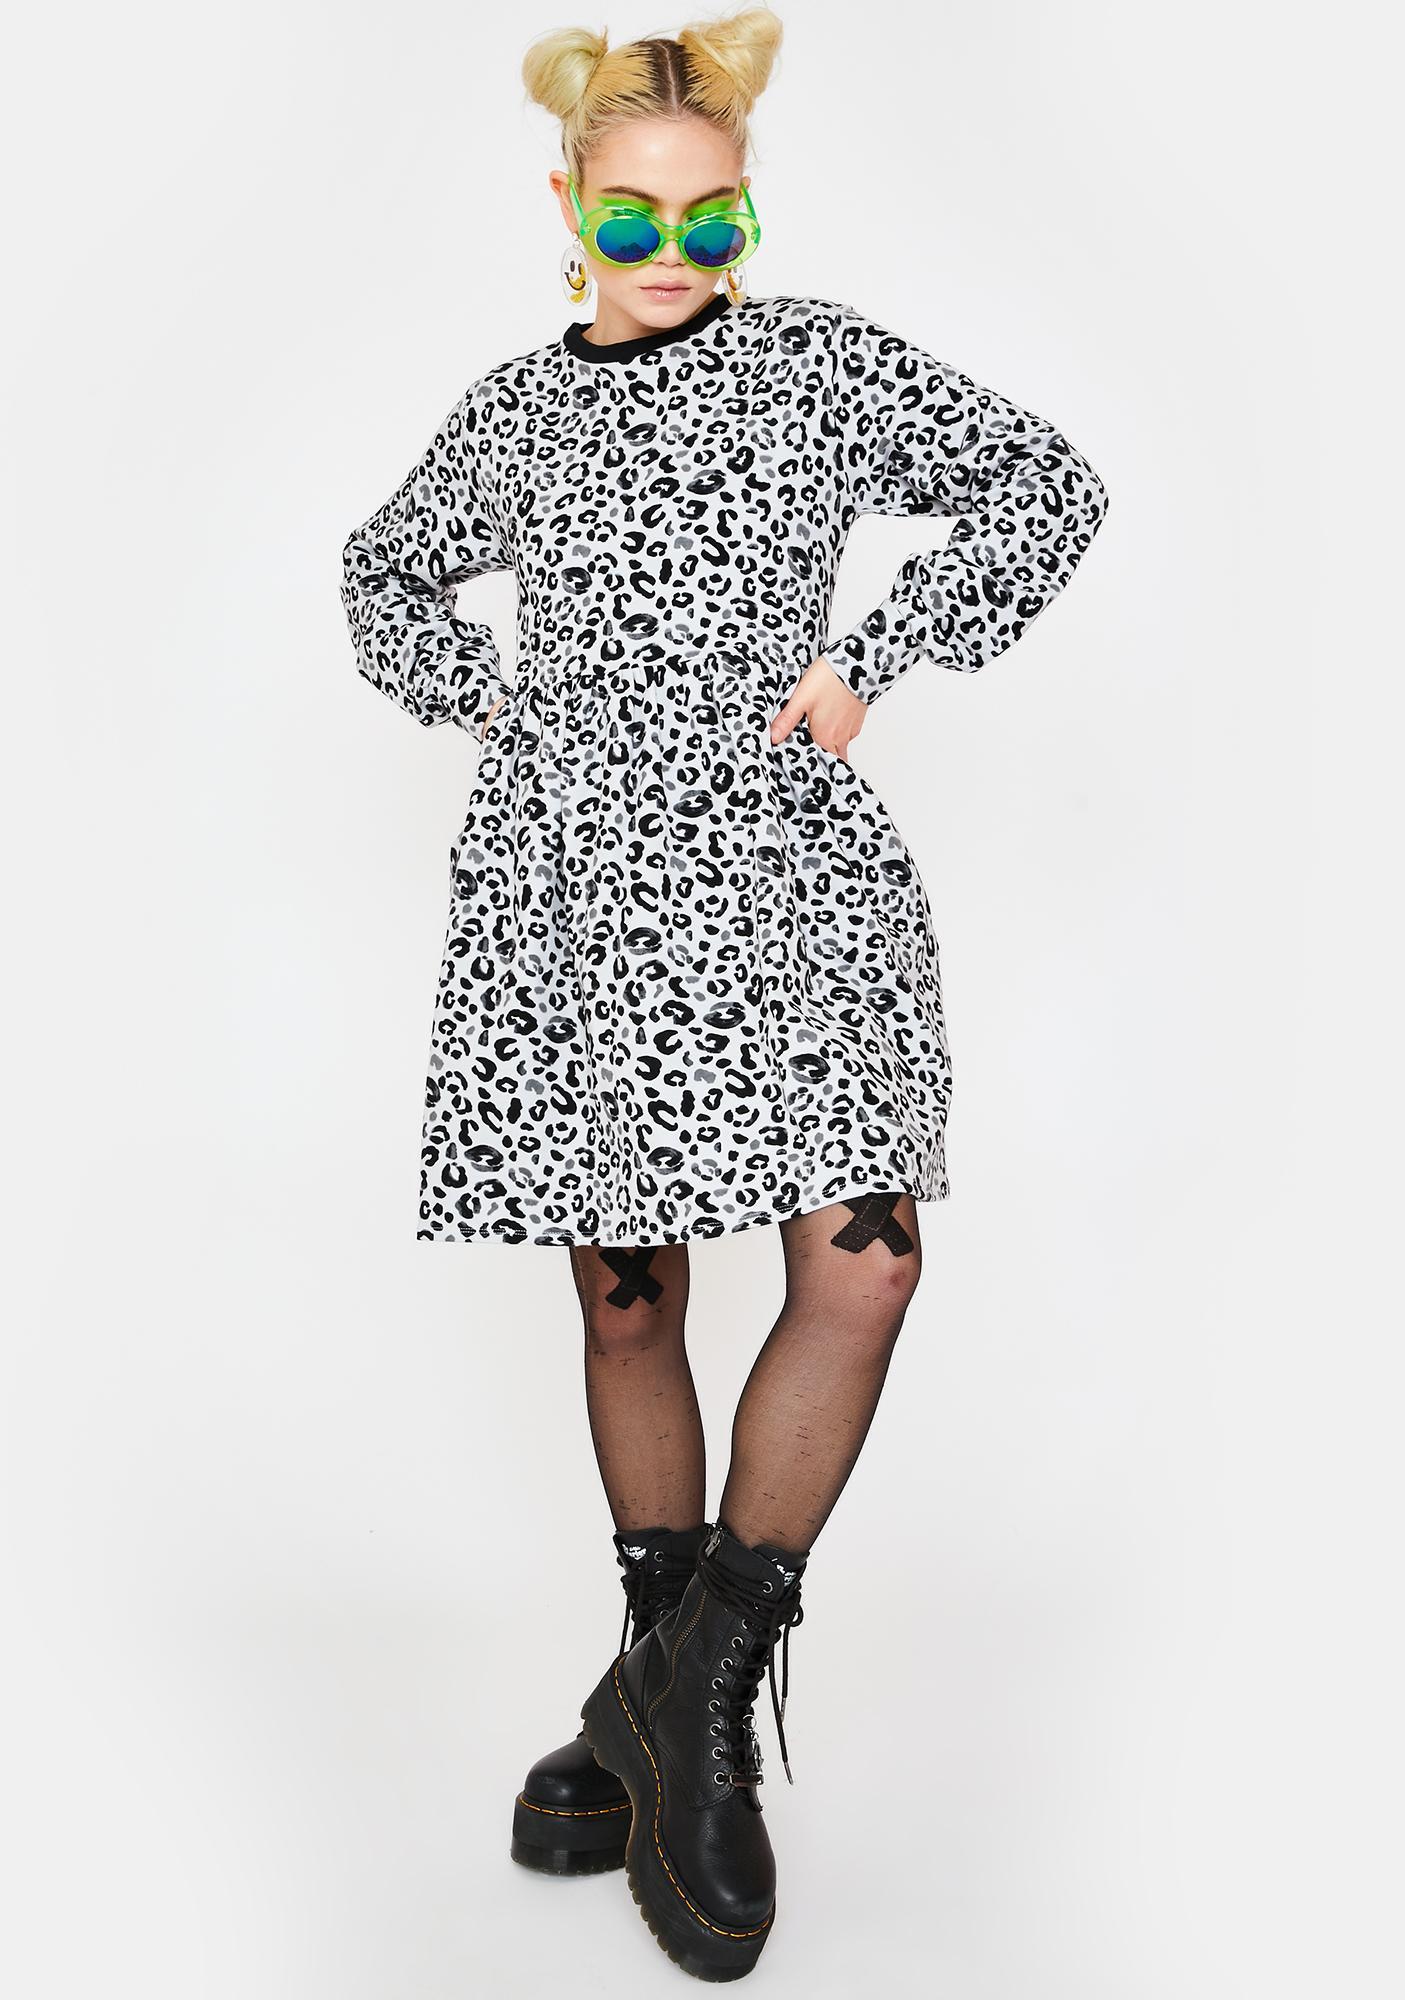 Tallulah's Threads Leopard Sweater Dress